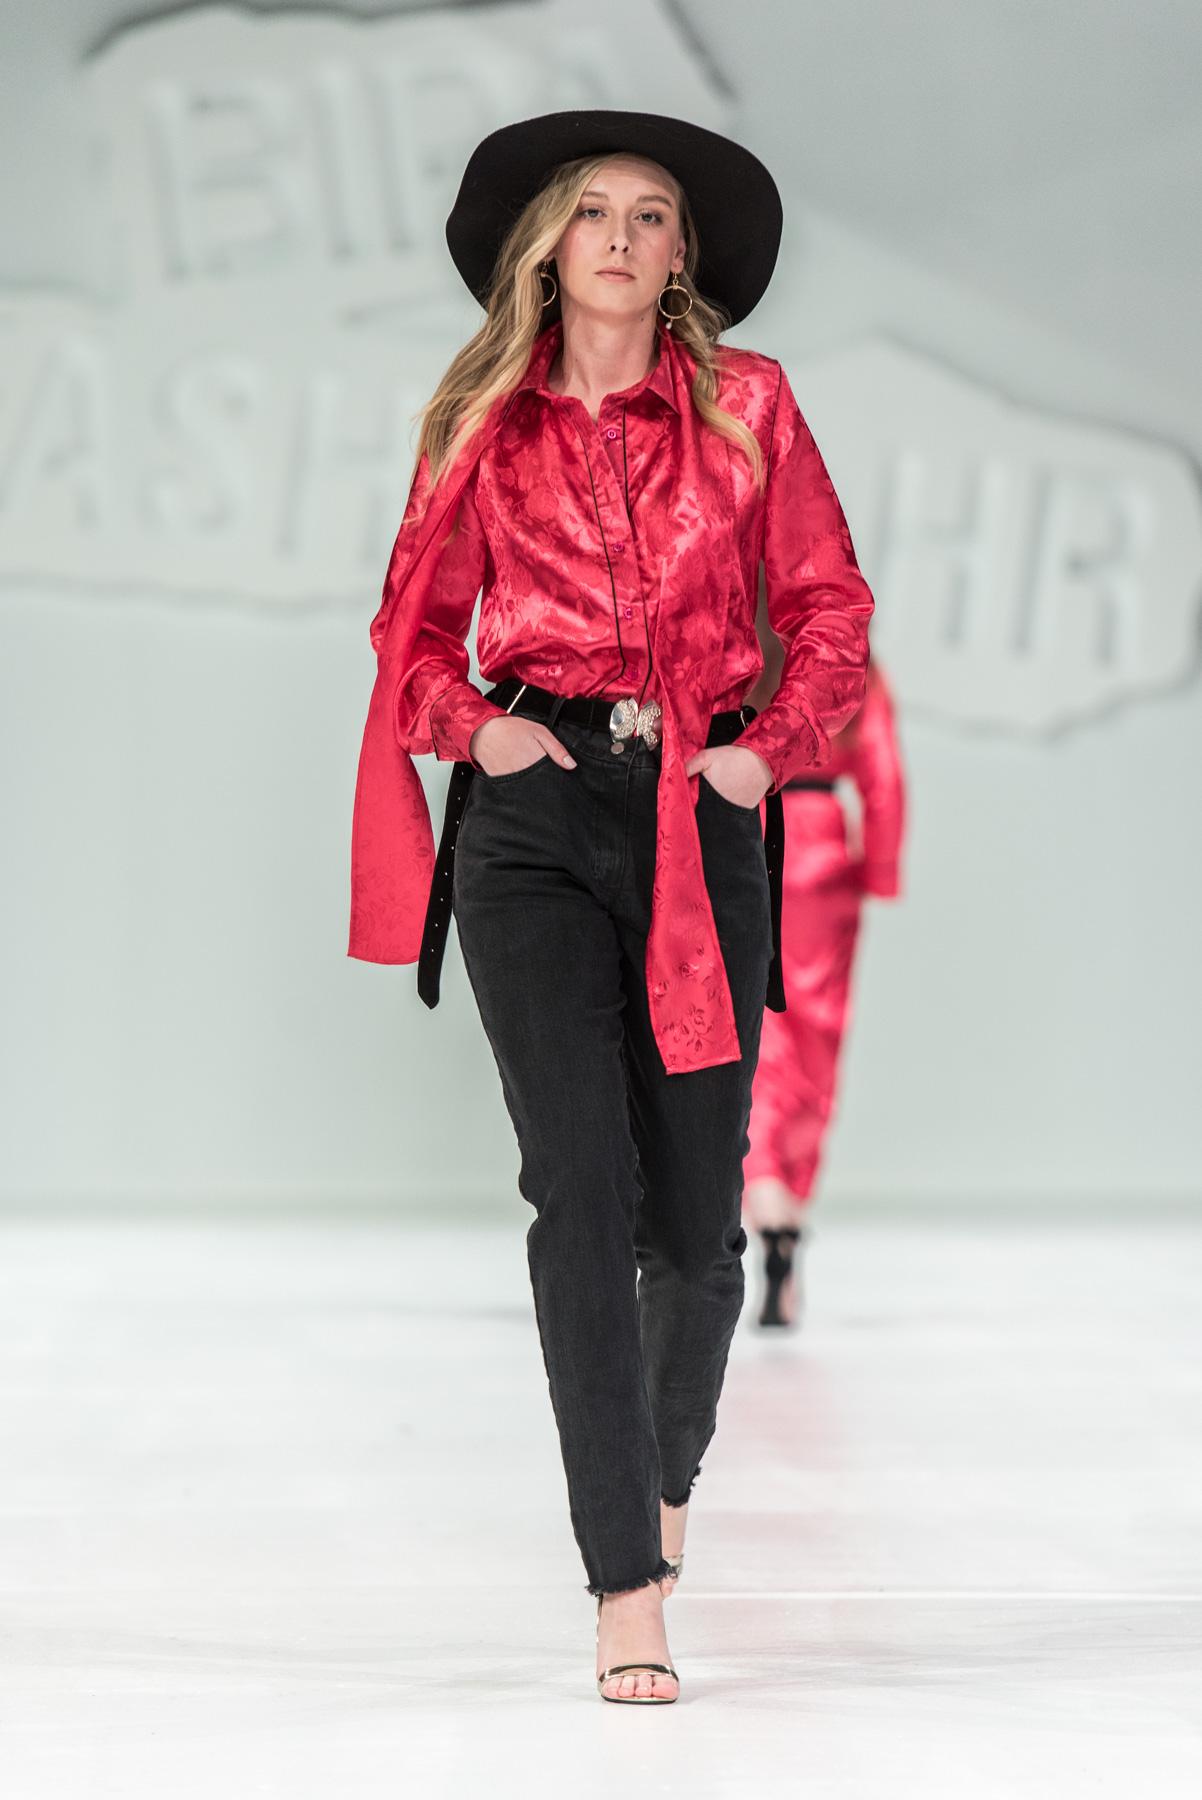 robert-sever-hrvatski-dizajner-iva-proljetna-kolekcija-2018 (38).jpg